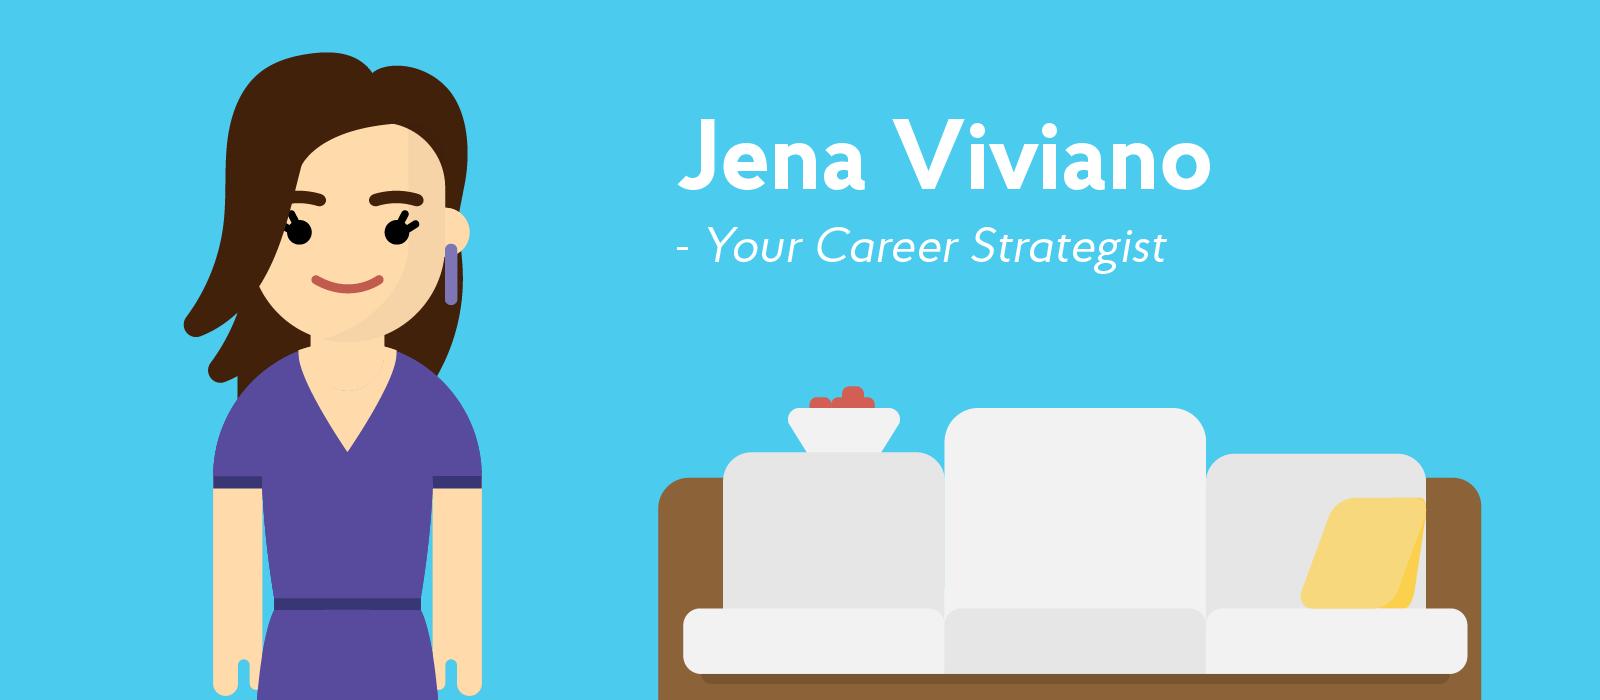 Jena Viviano career influencer